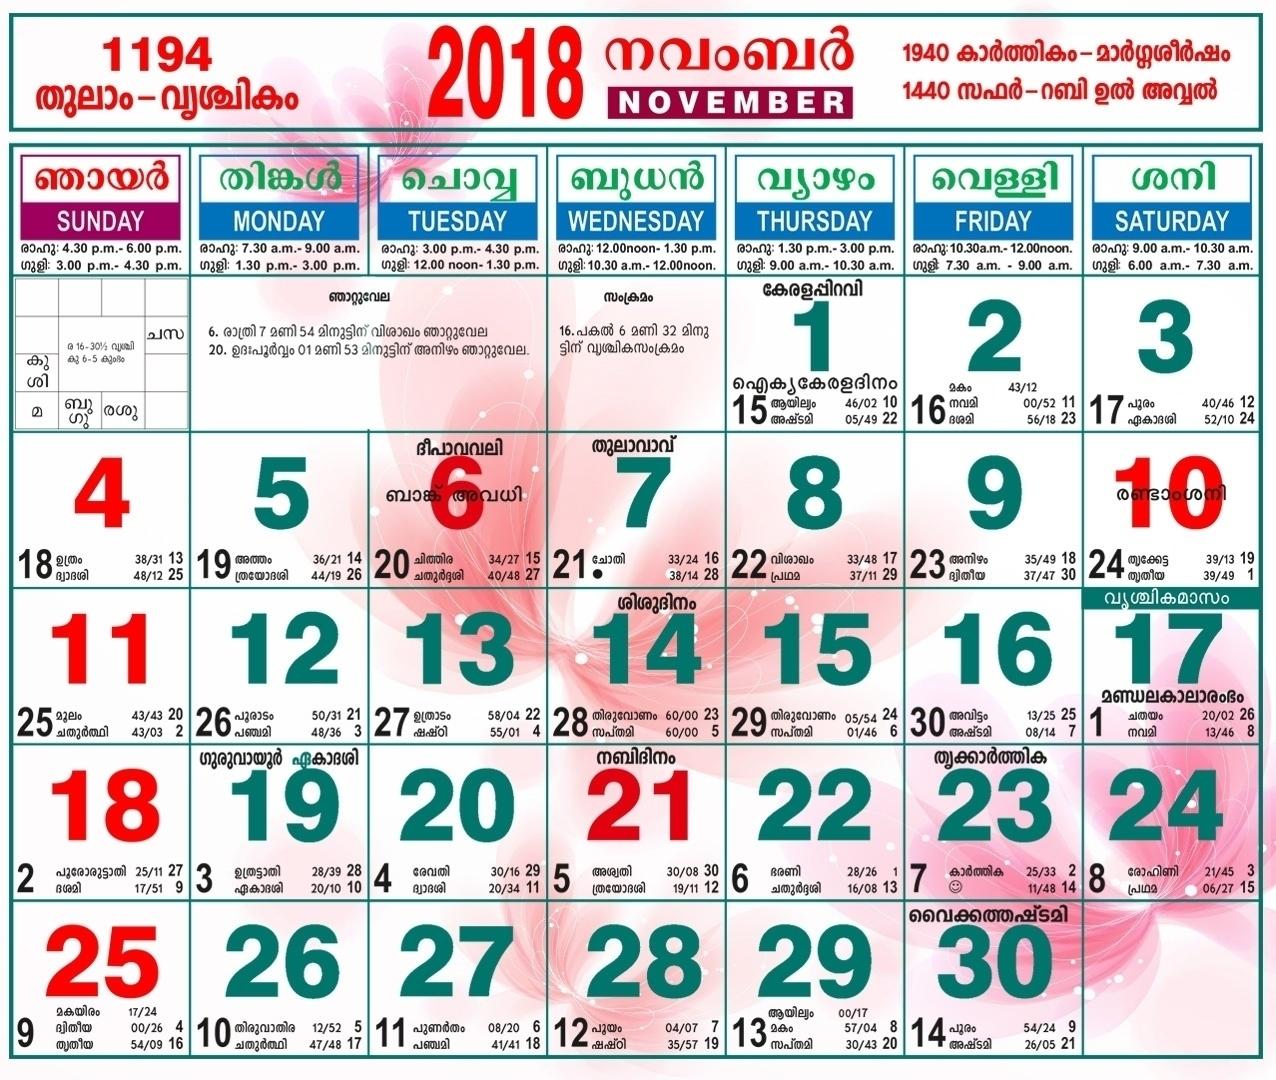 Tithi Toran Calender November 2018 | Template Calendar Printable with Vedic Calendar For Sep 27 1940